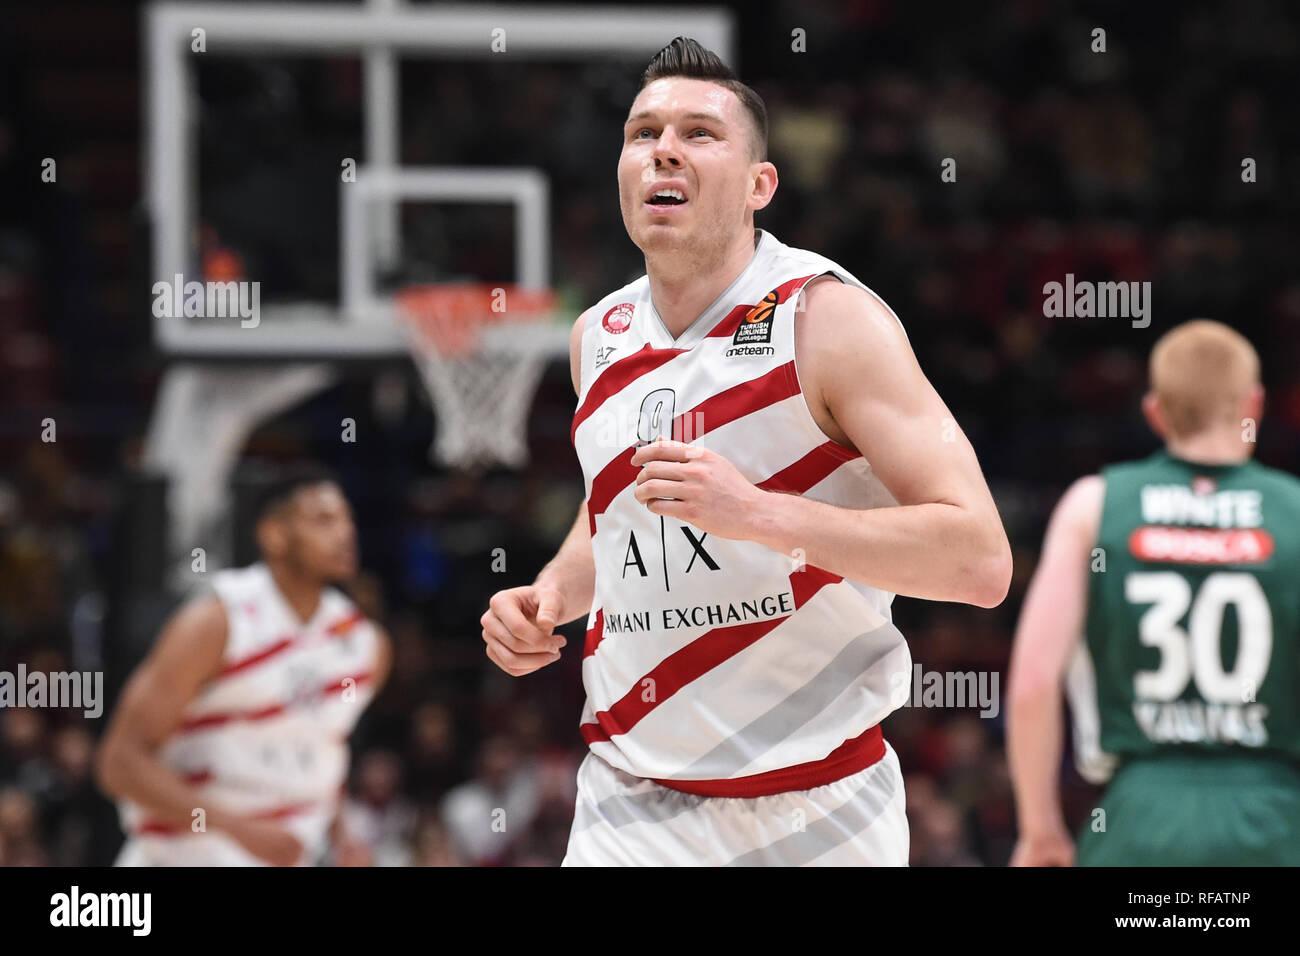 c20d4f4cb48af Foto Claudio Grassi LaPresse 24 gennaio 2019 Assago (MI) Italia sport  basket AX